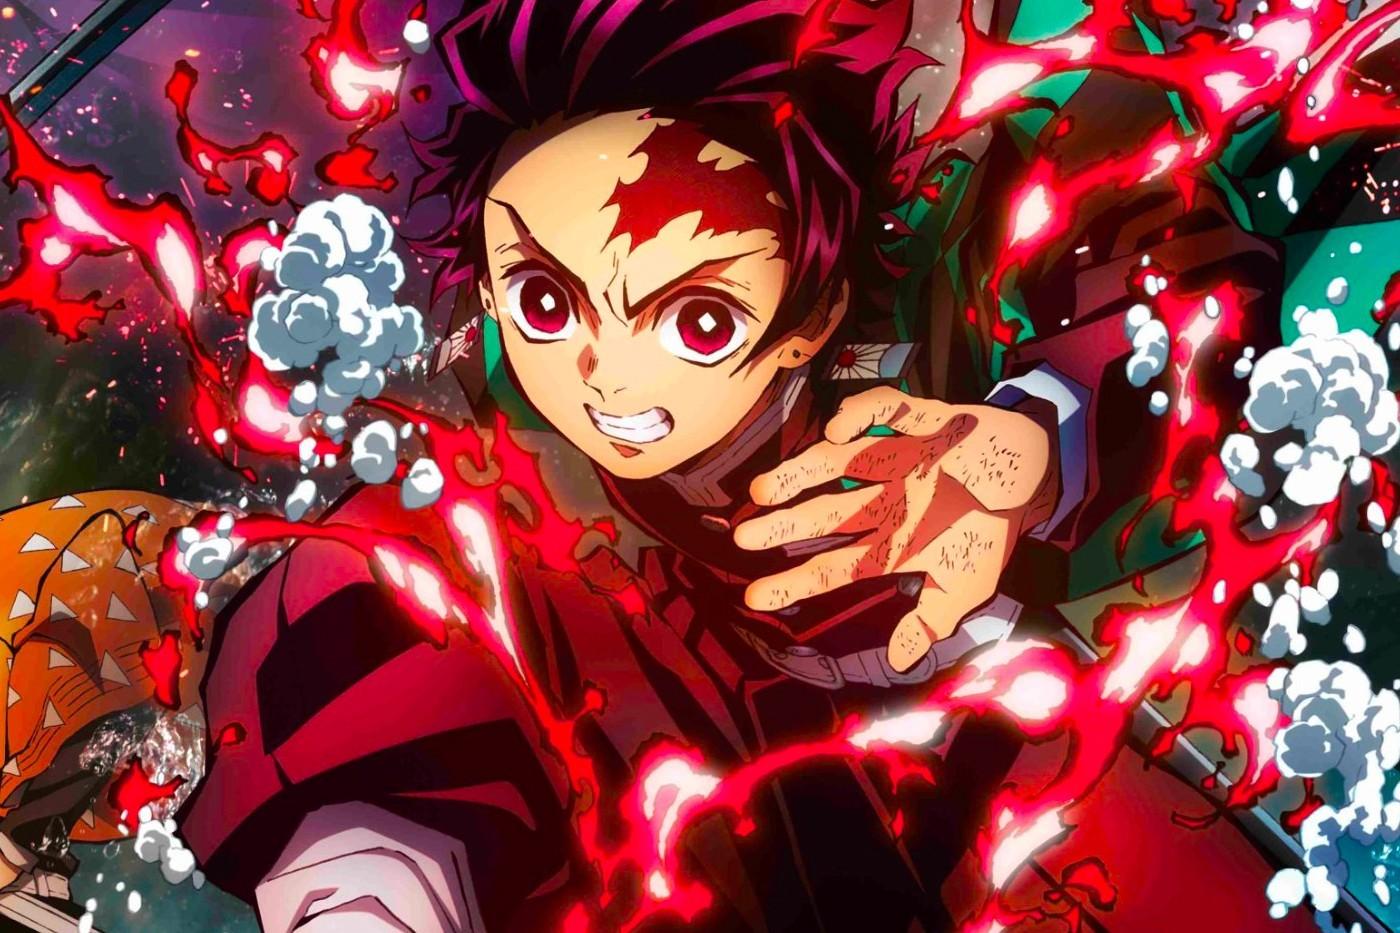 Demon Slayer: Kimetsu no Yaiba Akan Diadaptasi Jadi Game untuk PlayStation dan Microsoft Xbox One